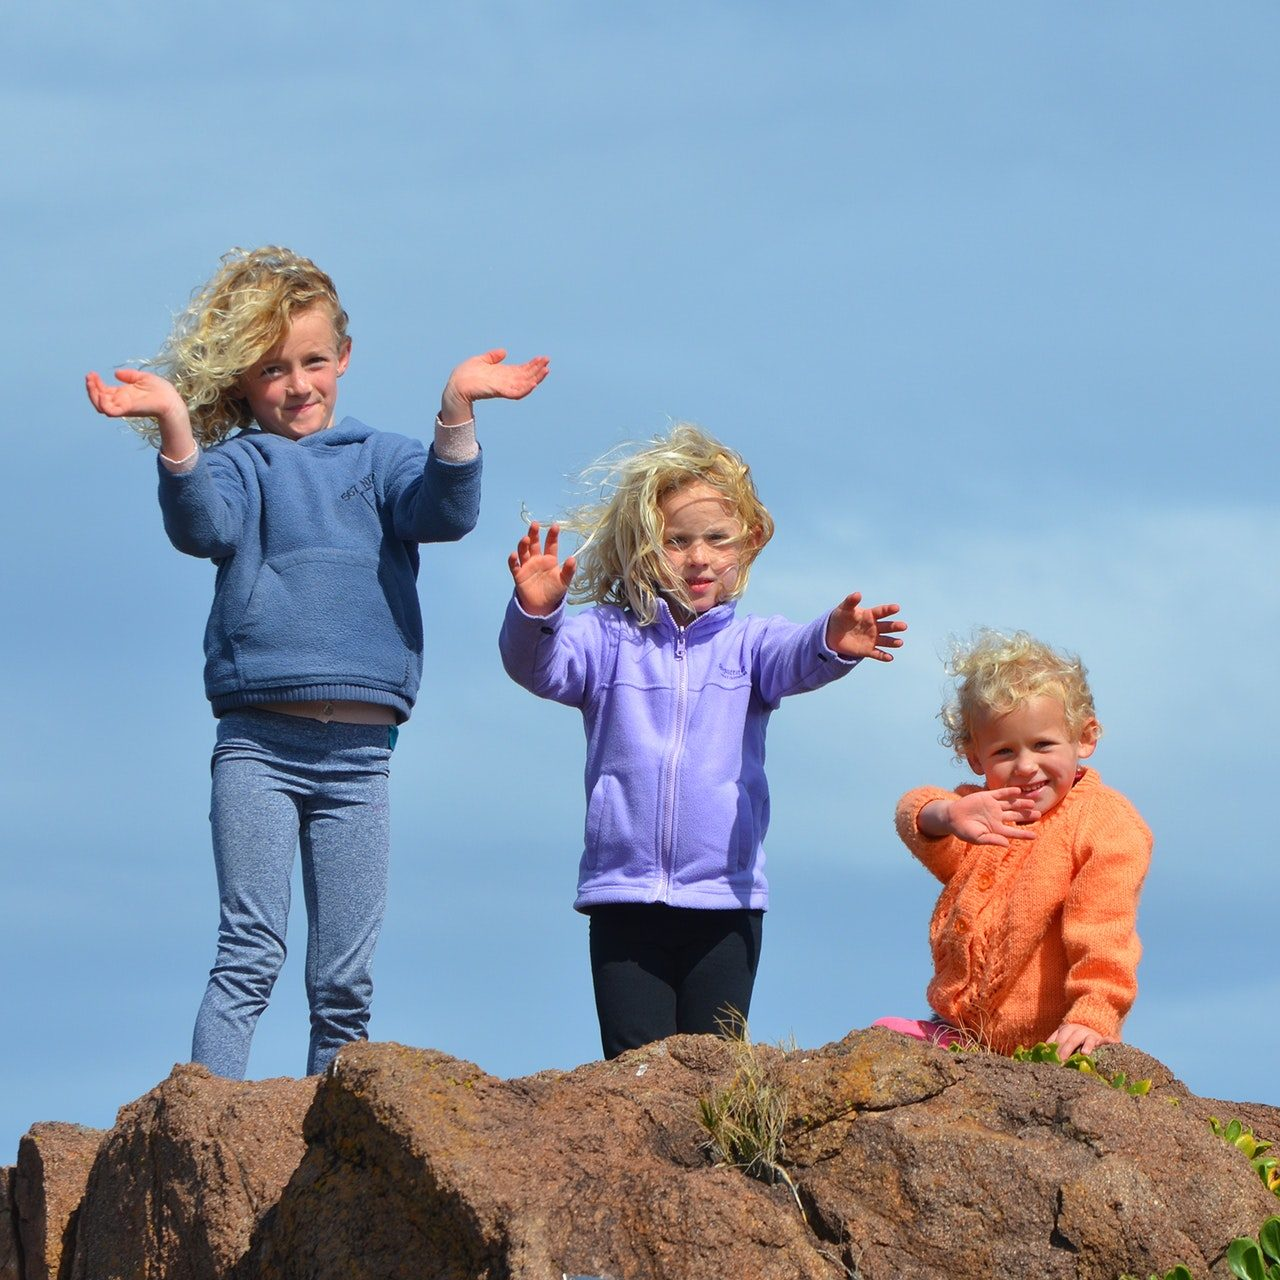 https://wisdomtreatment.com/wp-content/uploads/2020/07/3-kids-standing-on-rock-234544-1280x1280.jpg